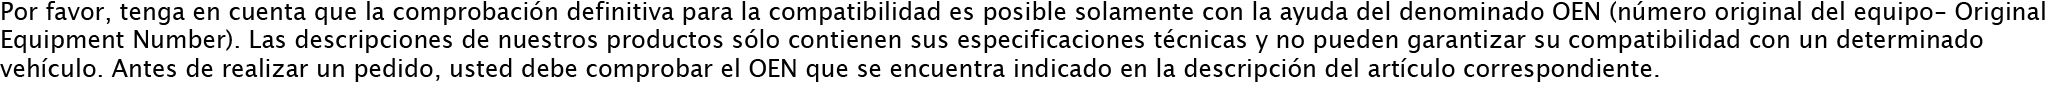 VALEO 191955427B, 357955427, 431998003, 357955427, VFB53 Limpiaparabrisas